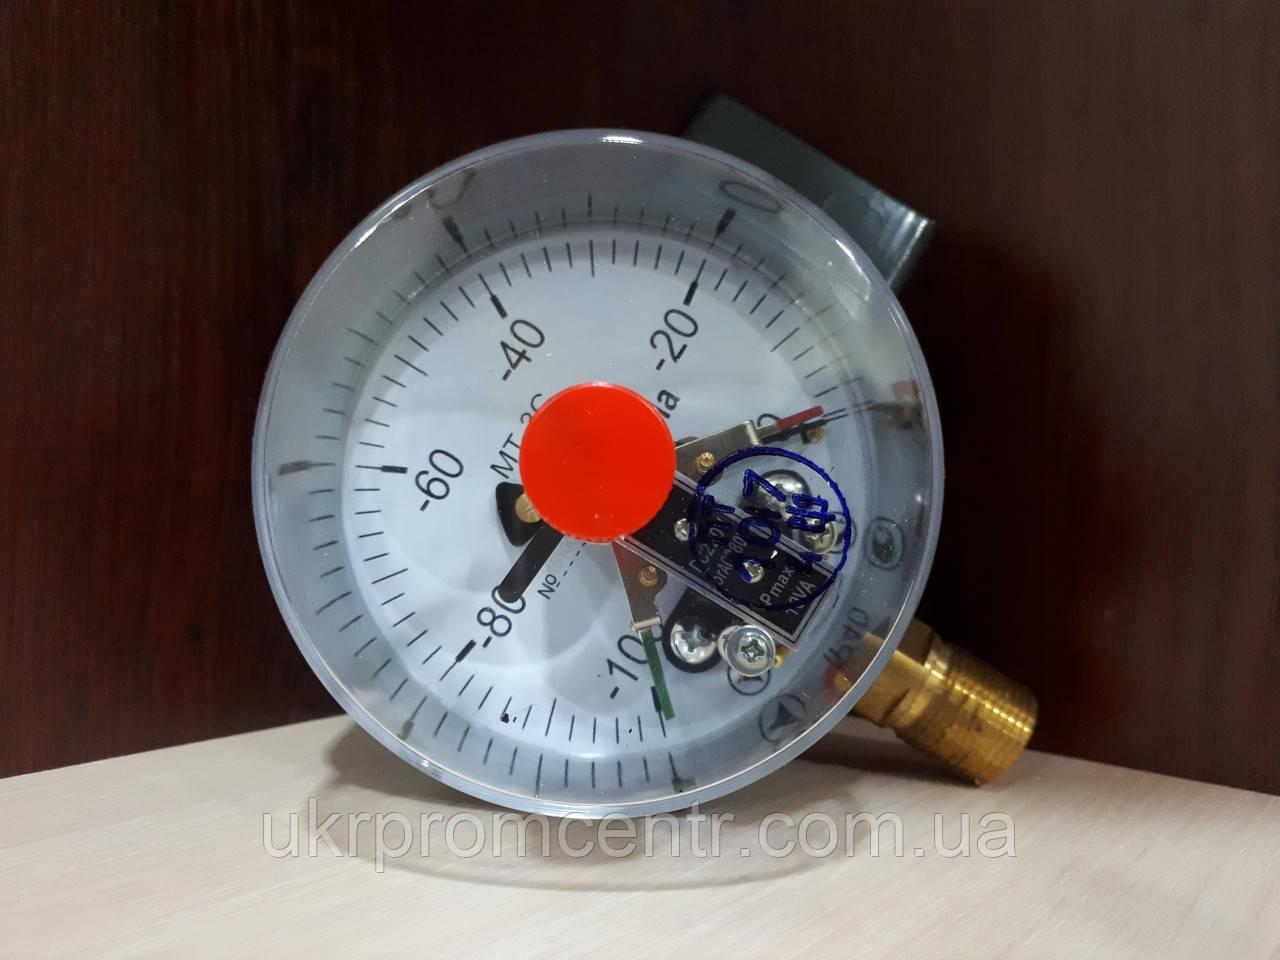 Вакуумметр електроконтактні МТ-3С